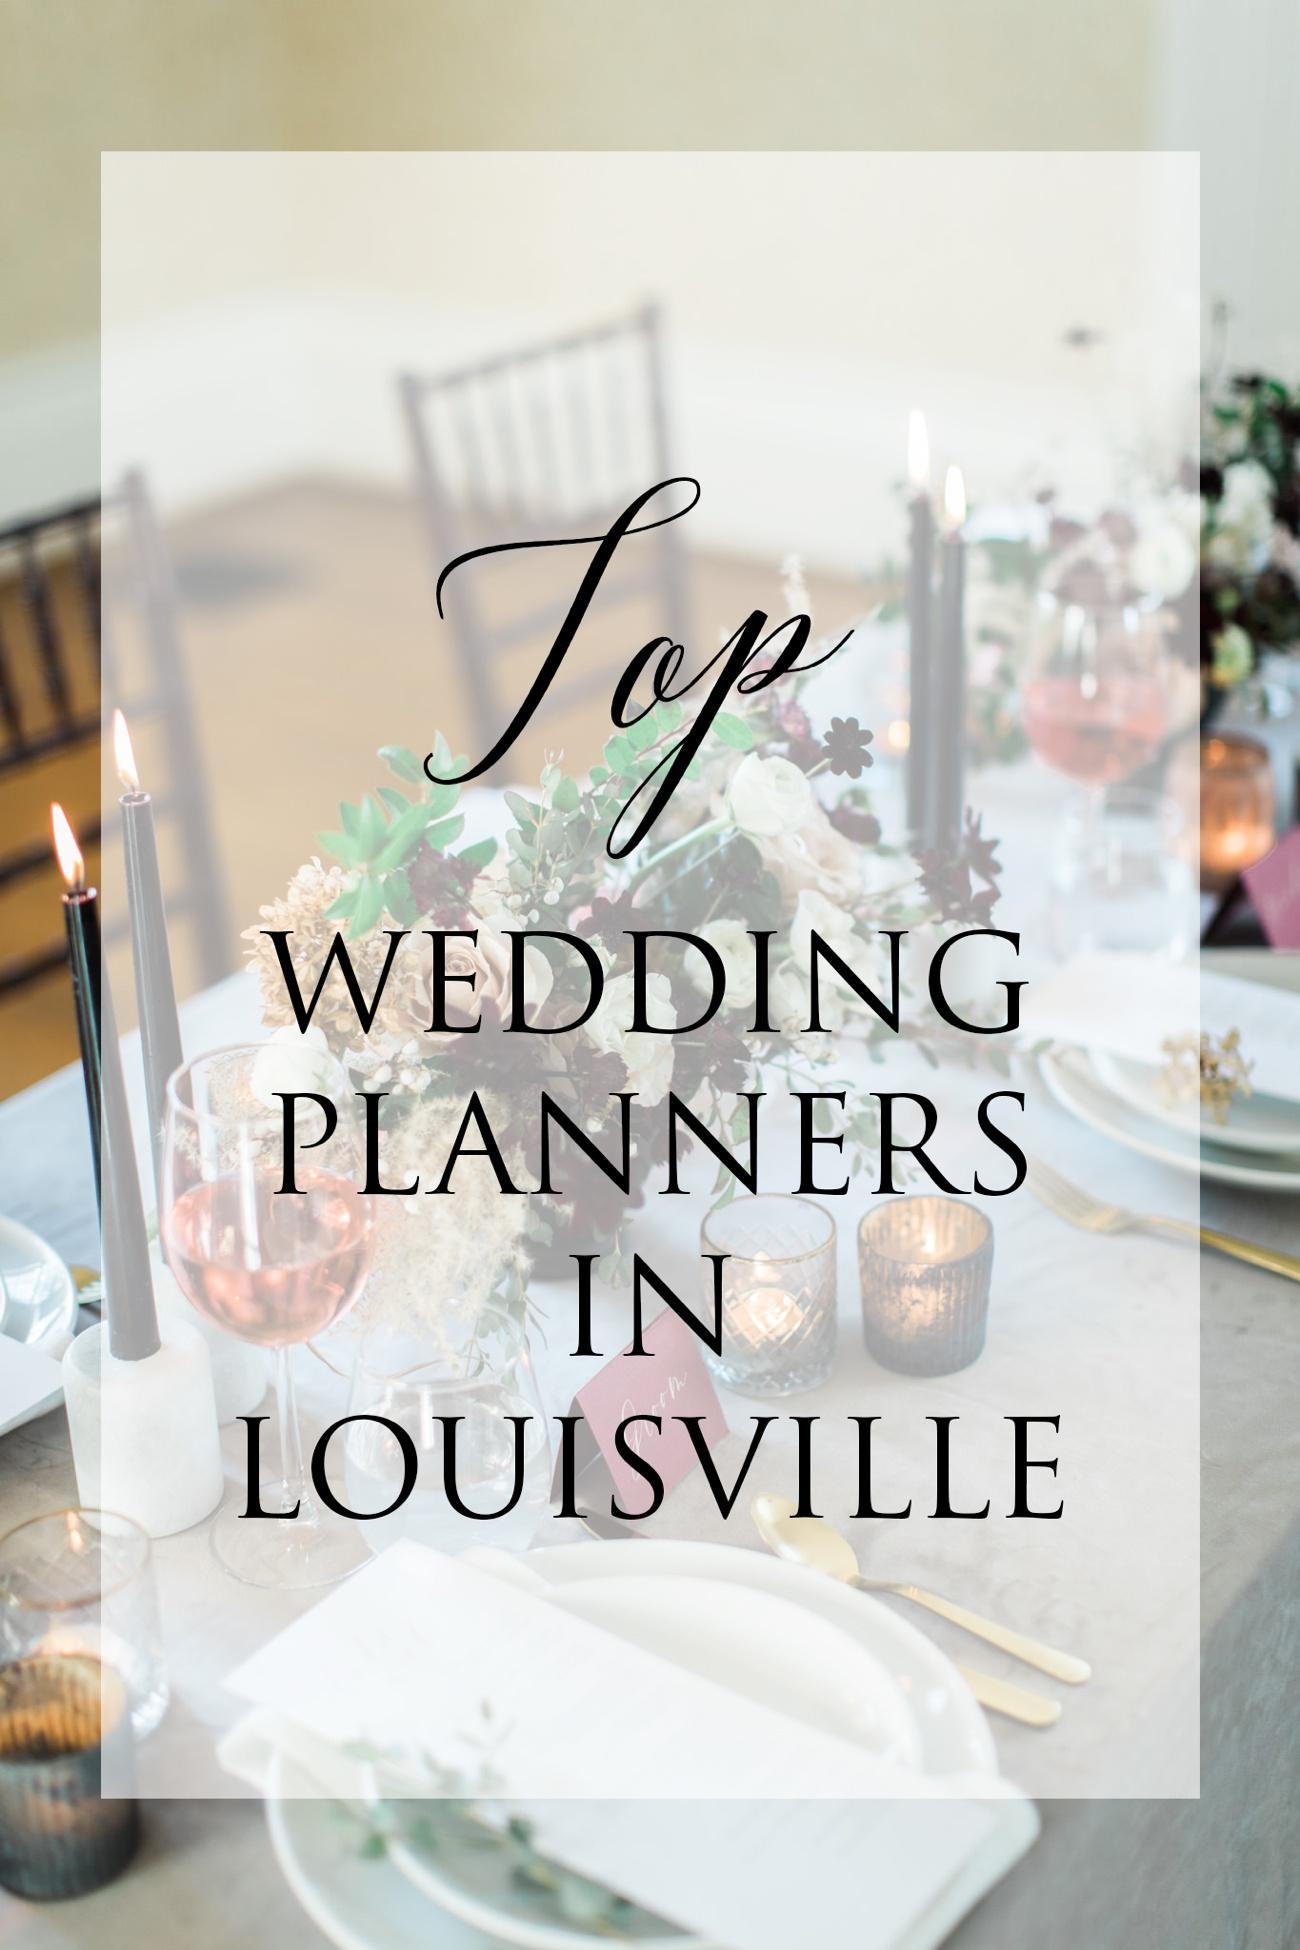 Top Wedding Planners in Louisville, KY